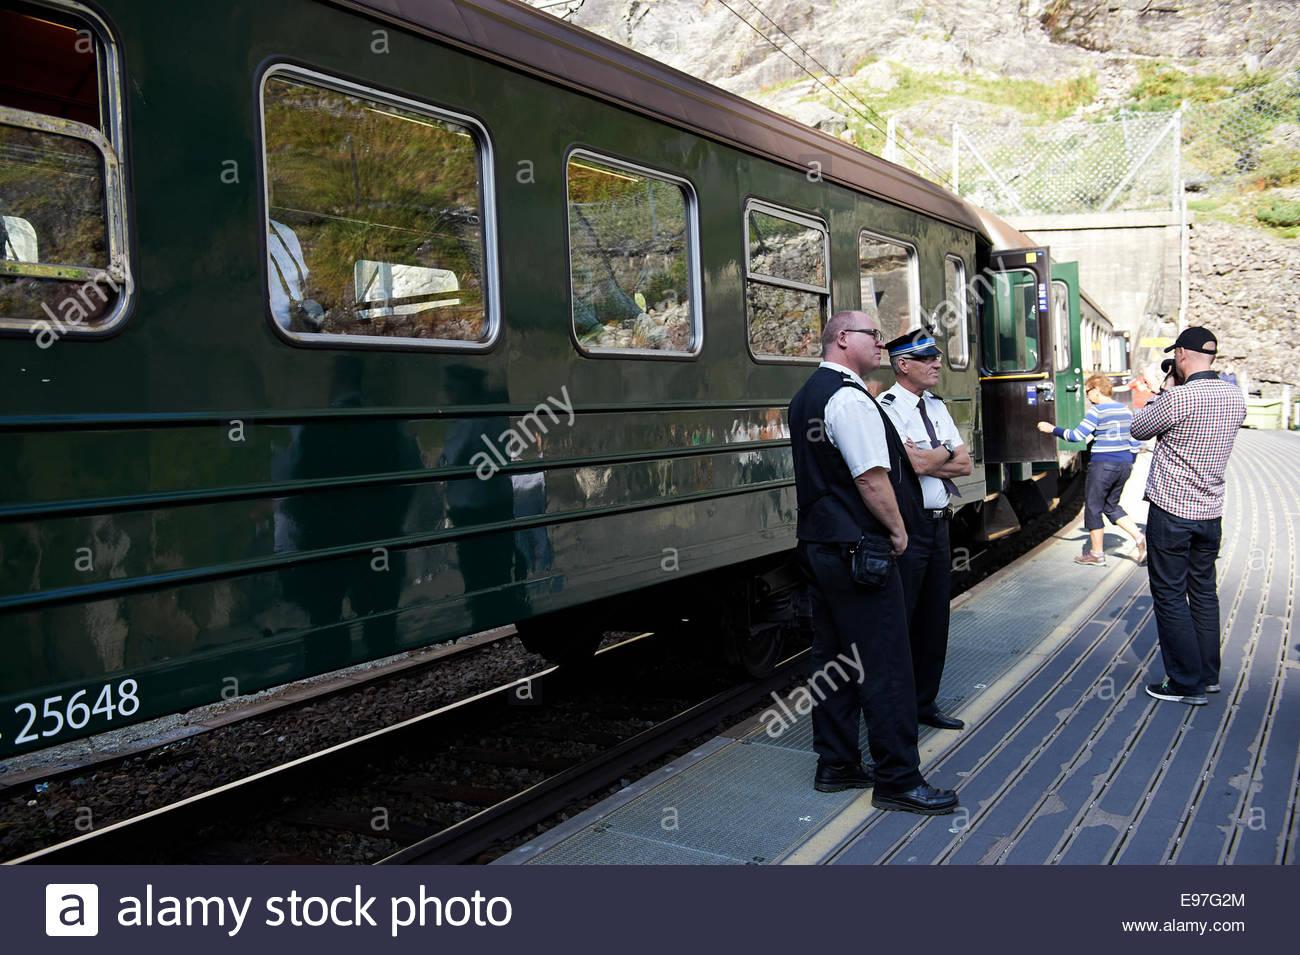 Train, Tourists and Railway Officials at the Kjosfossen Waterfall Platform of the Flamsbana Railway, Flam, Aurlandsfjord, - Stock Image